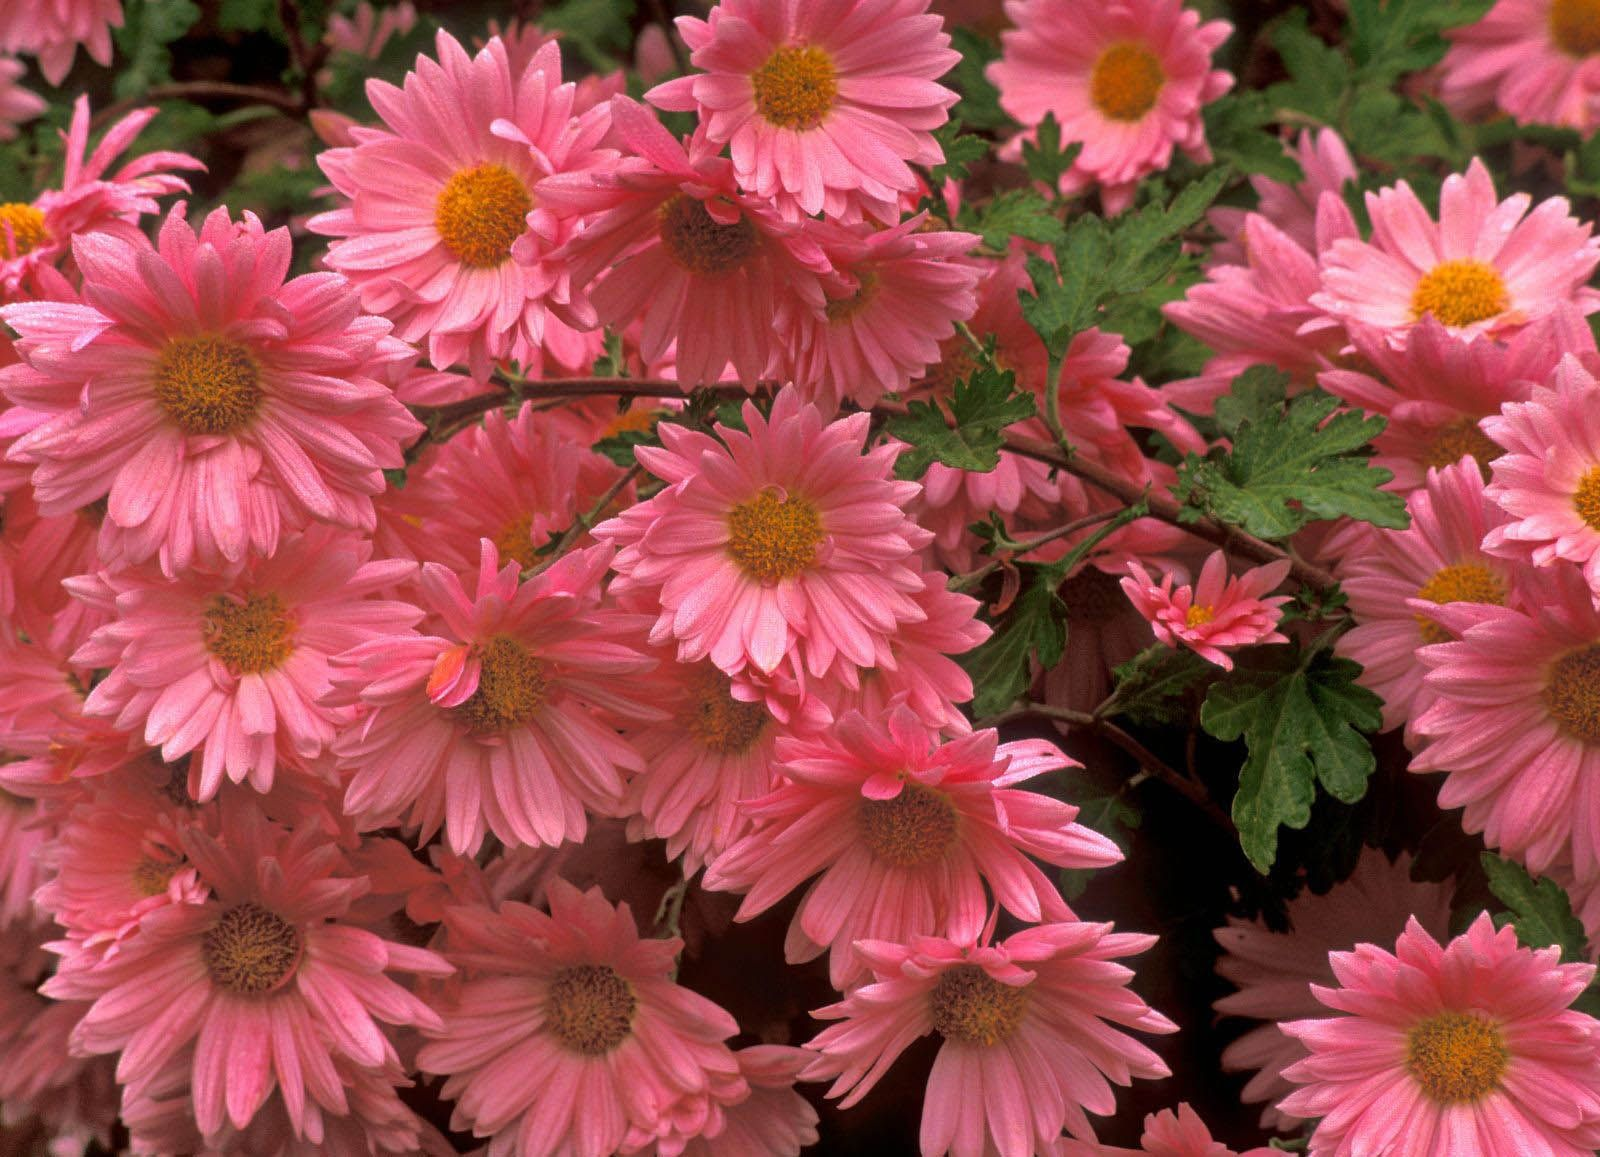 Hd Wallpaper Pink Flowers Wallpapers 4k Pinterest Pink Daisy